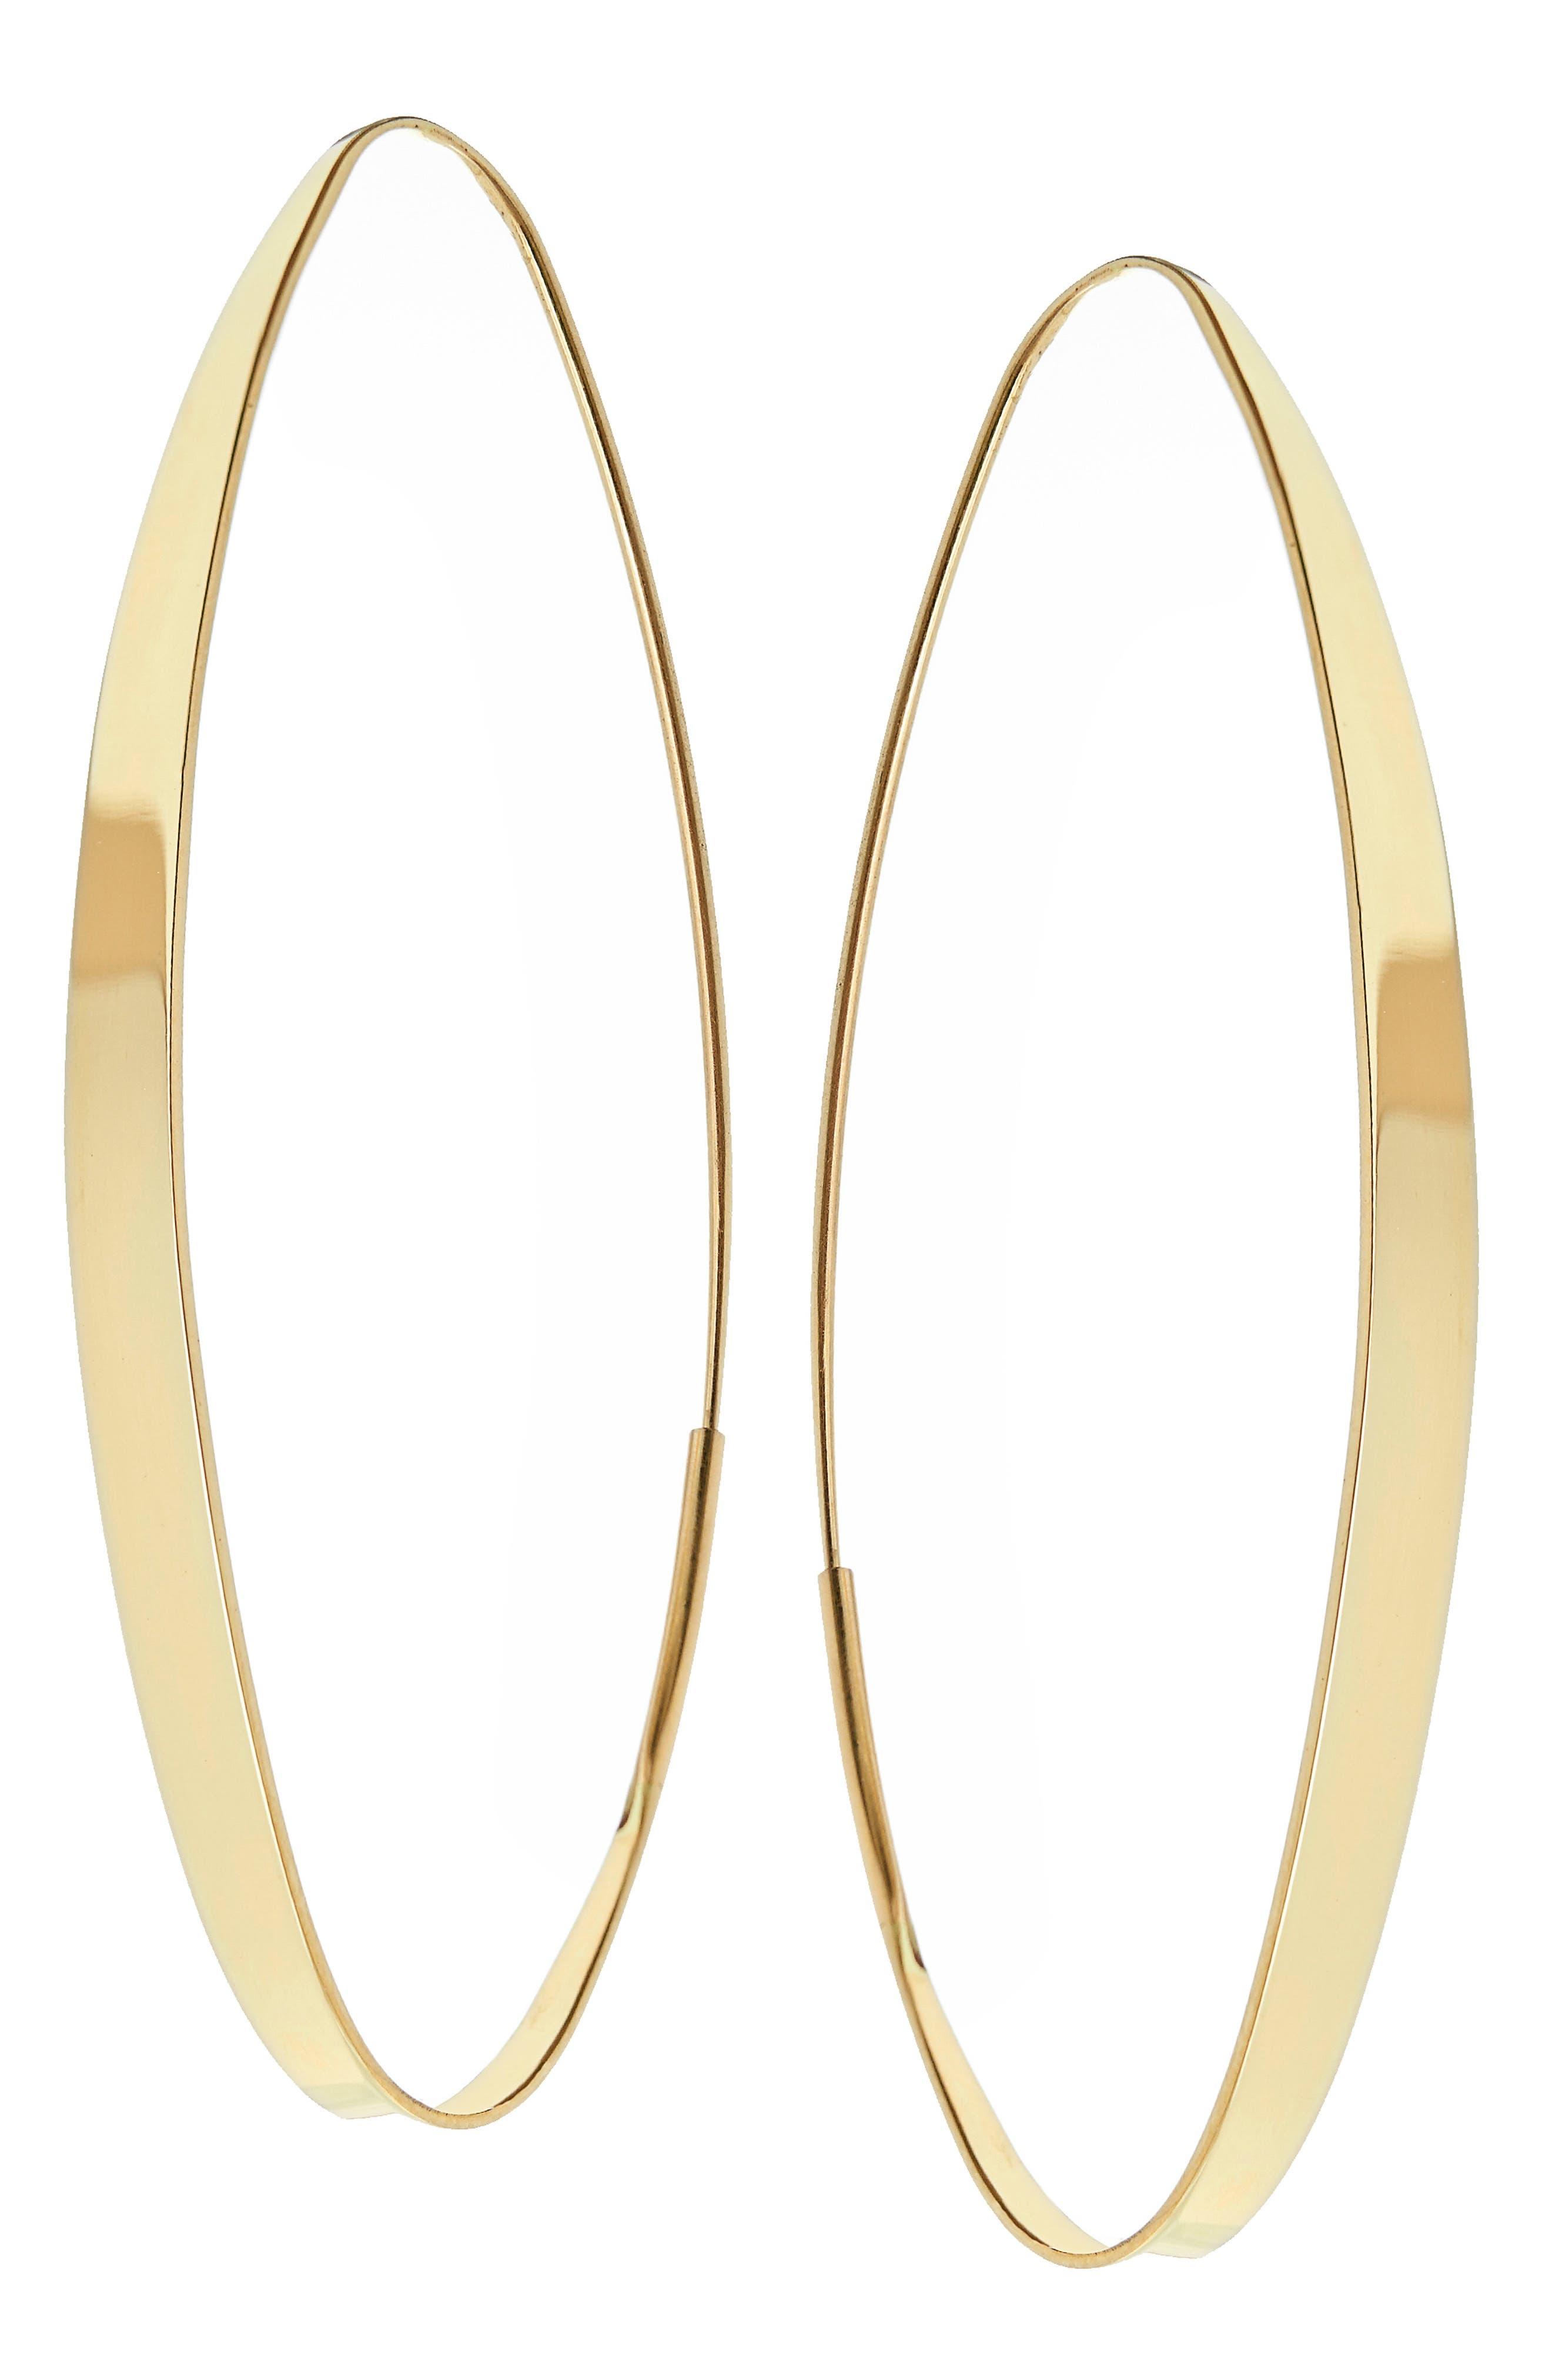 Alternate Image 1 Selected - Lana Jewelry Large Narrow Gloss Magic Hoops